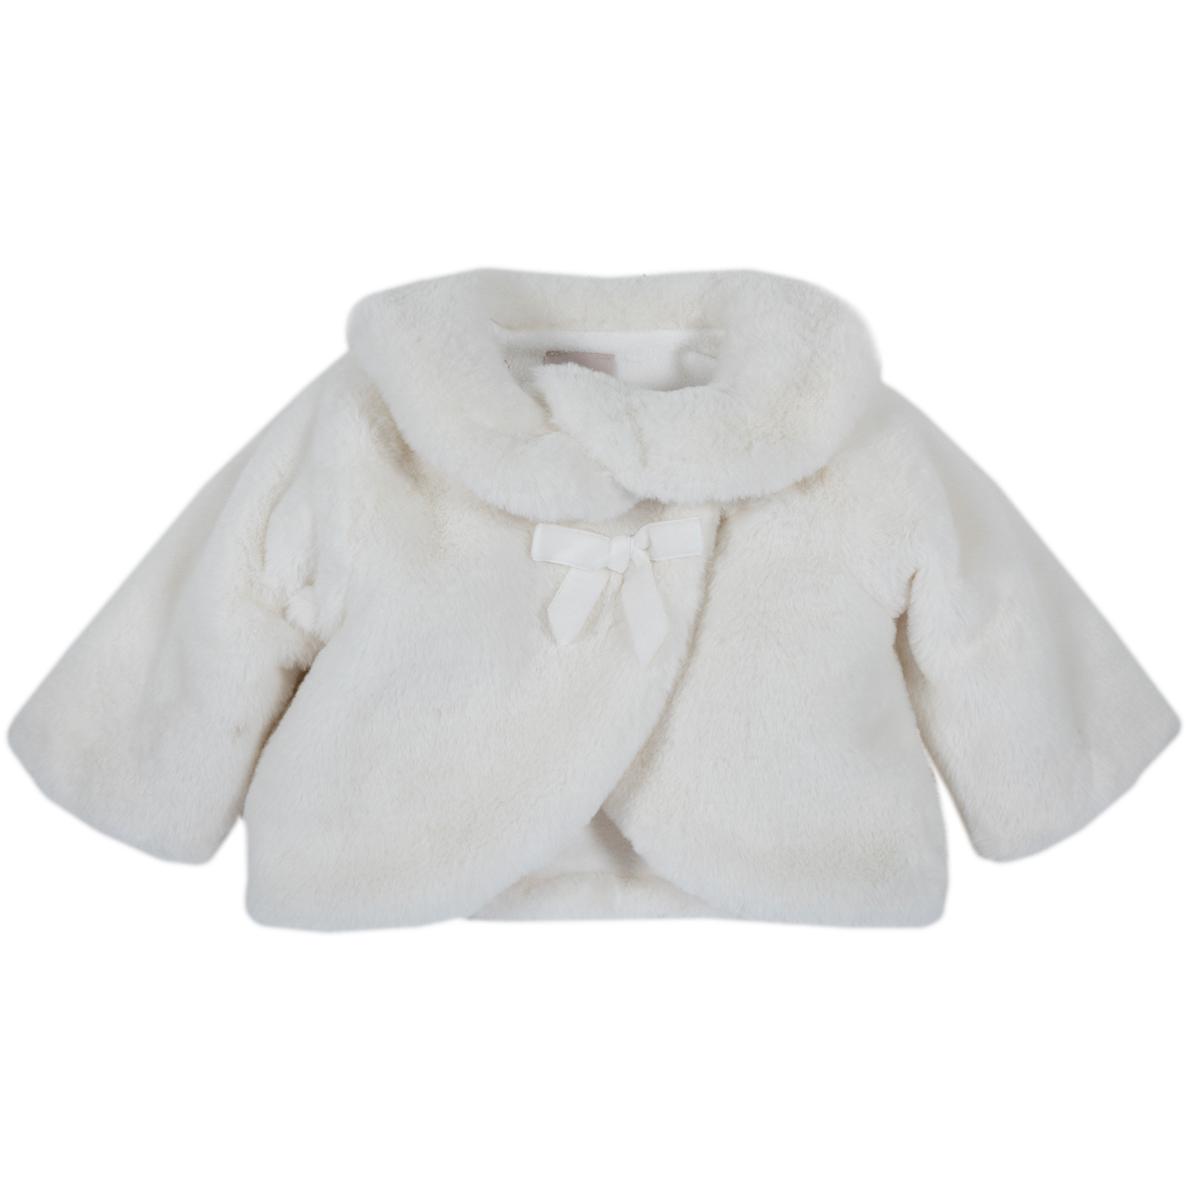 Jacheta copii Chicco, blanita artificiala, alb, 82383 din categoria Jachete copii